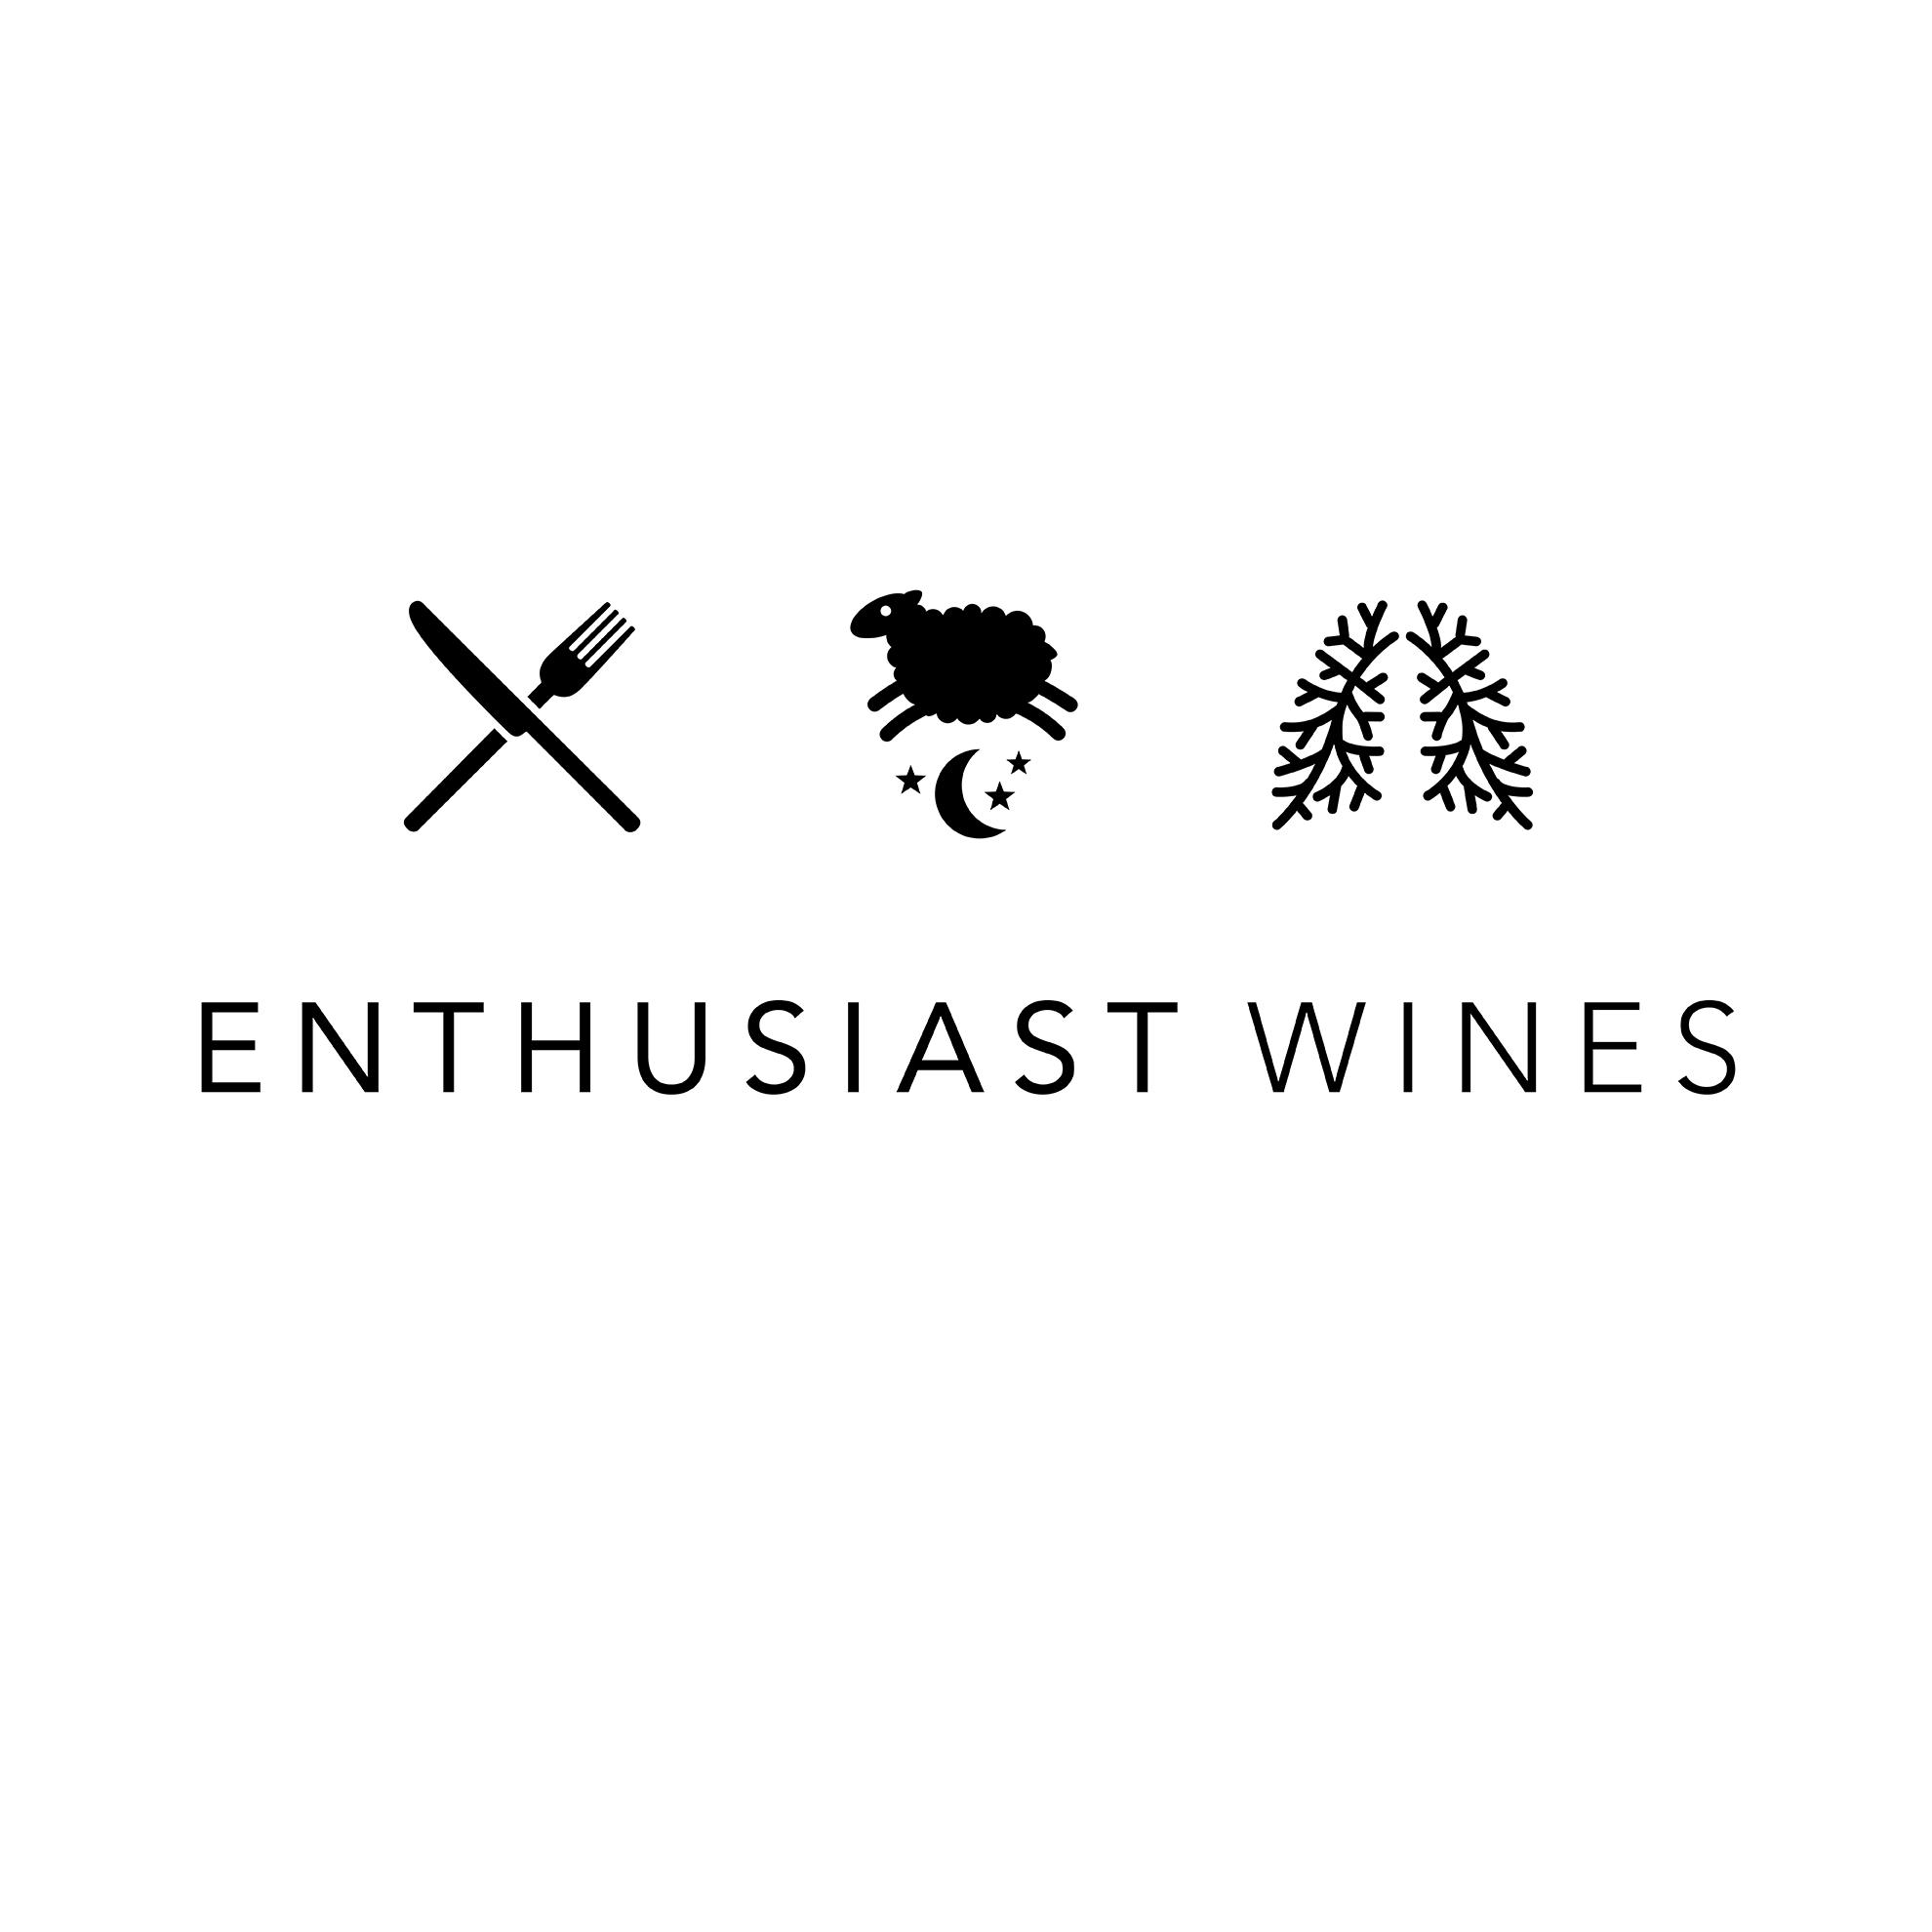 Enthusiast Wines logo